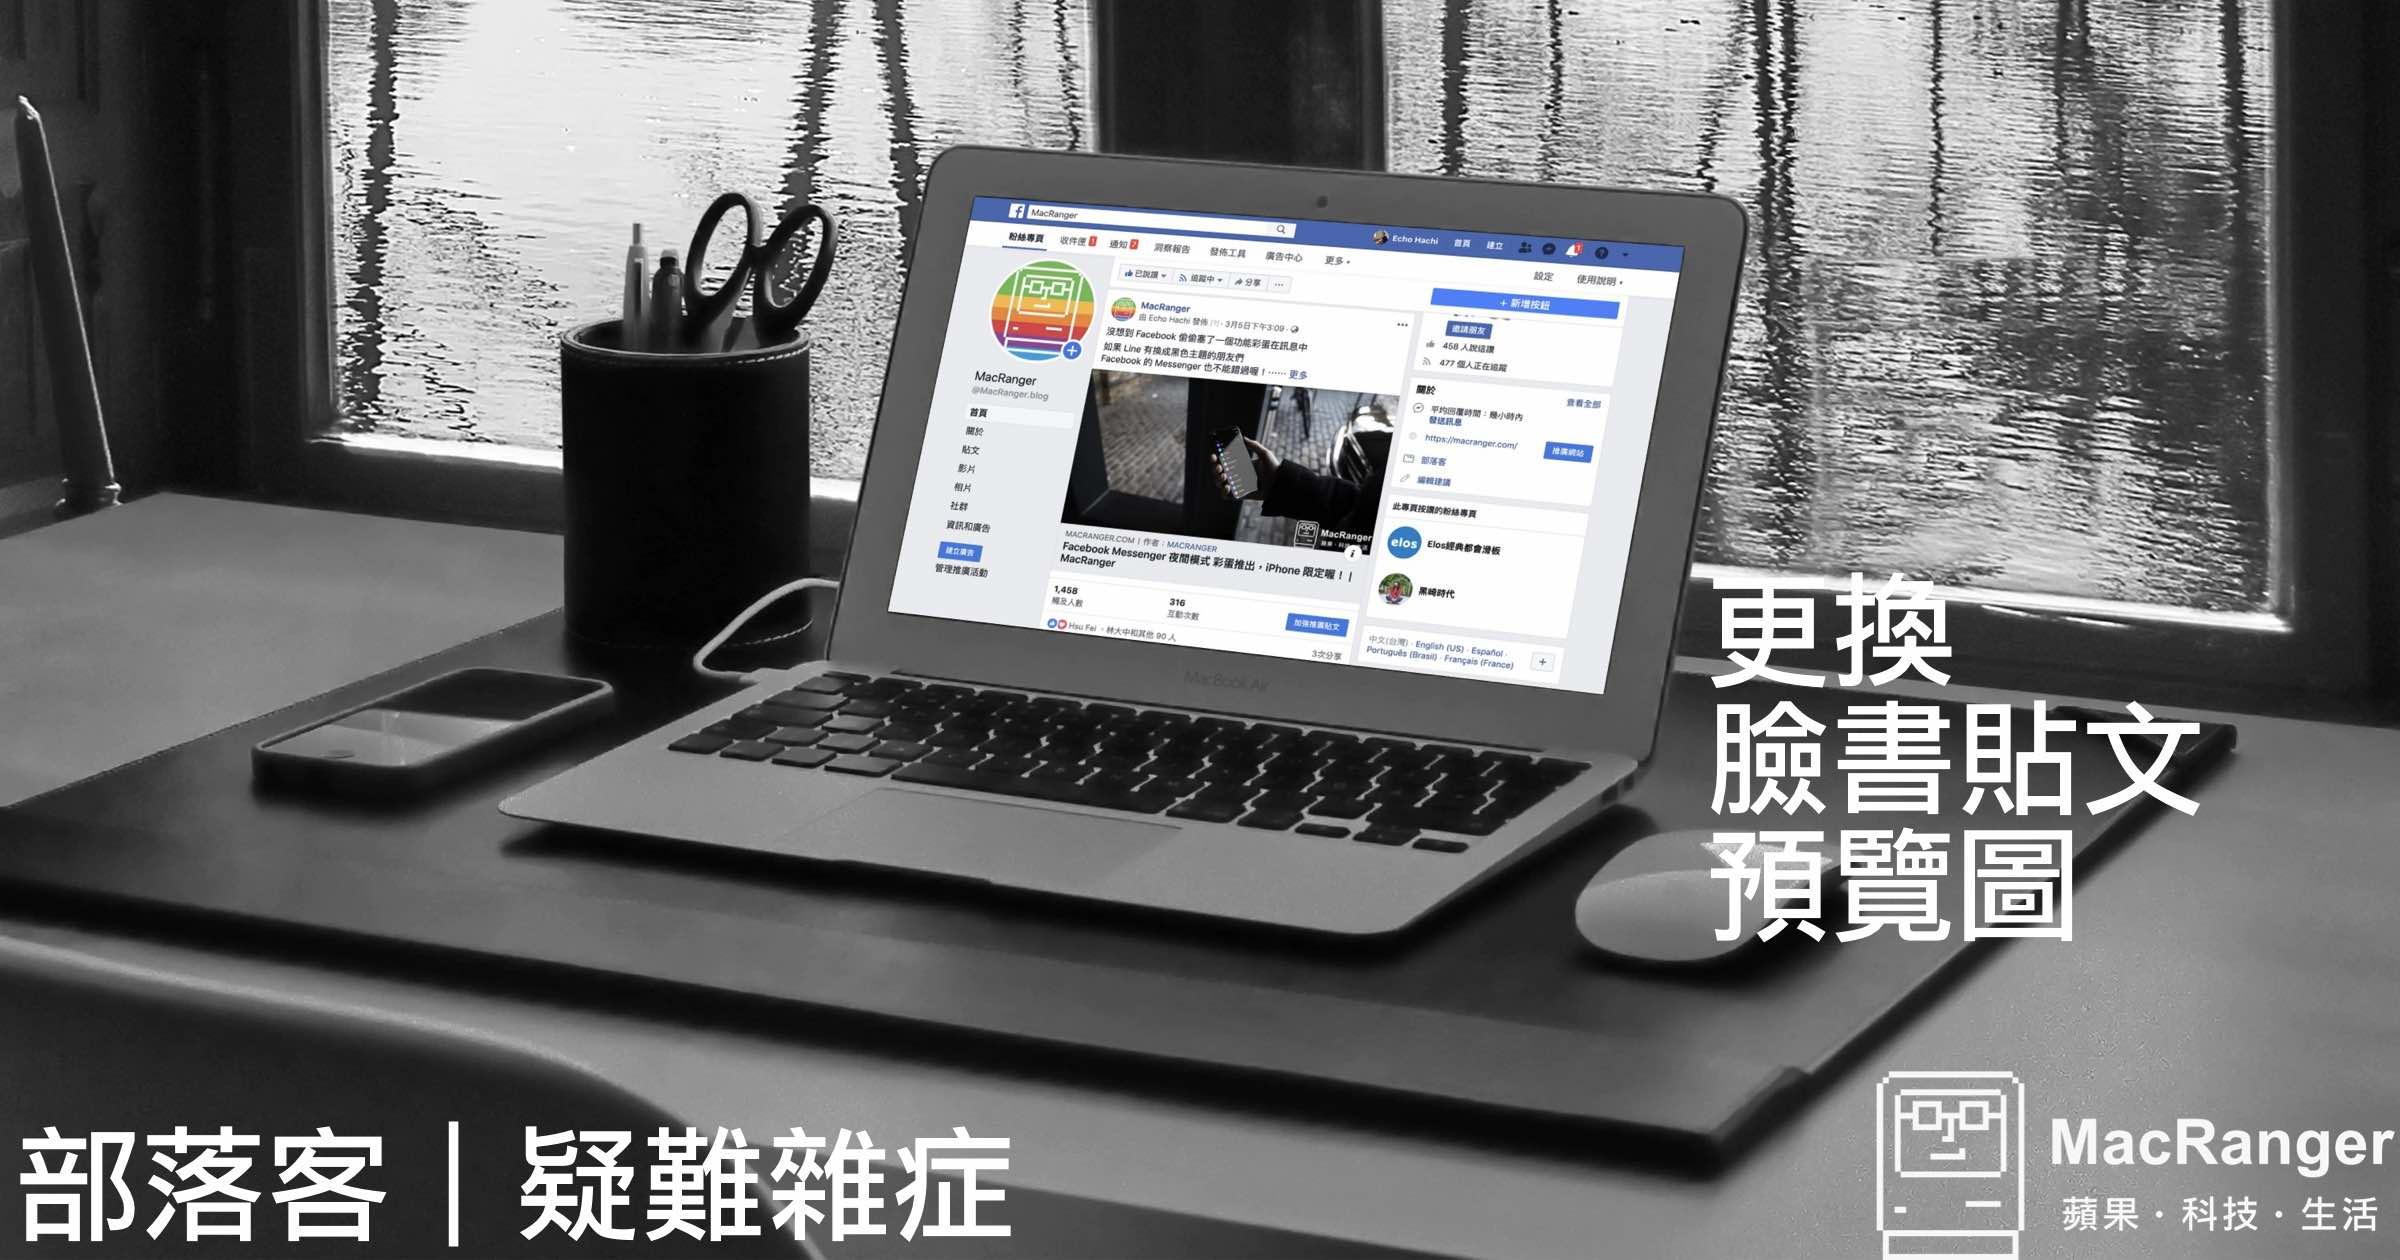 Facebook 預覽圖